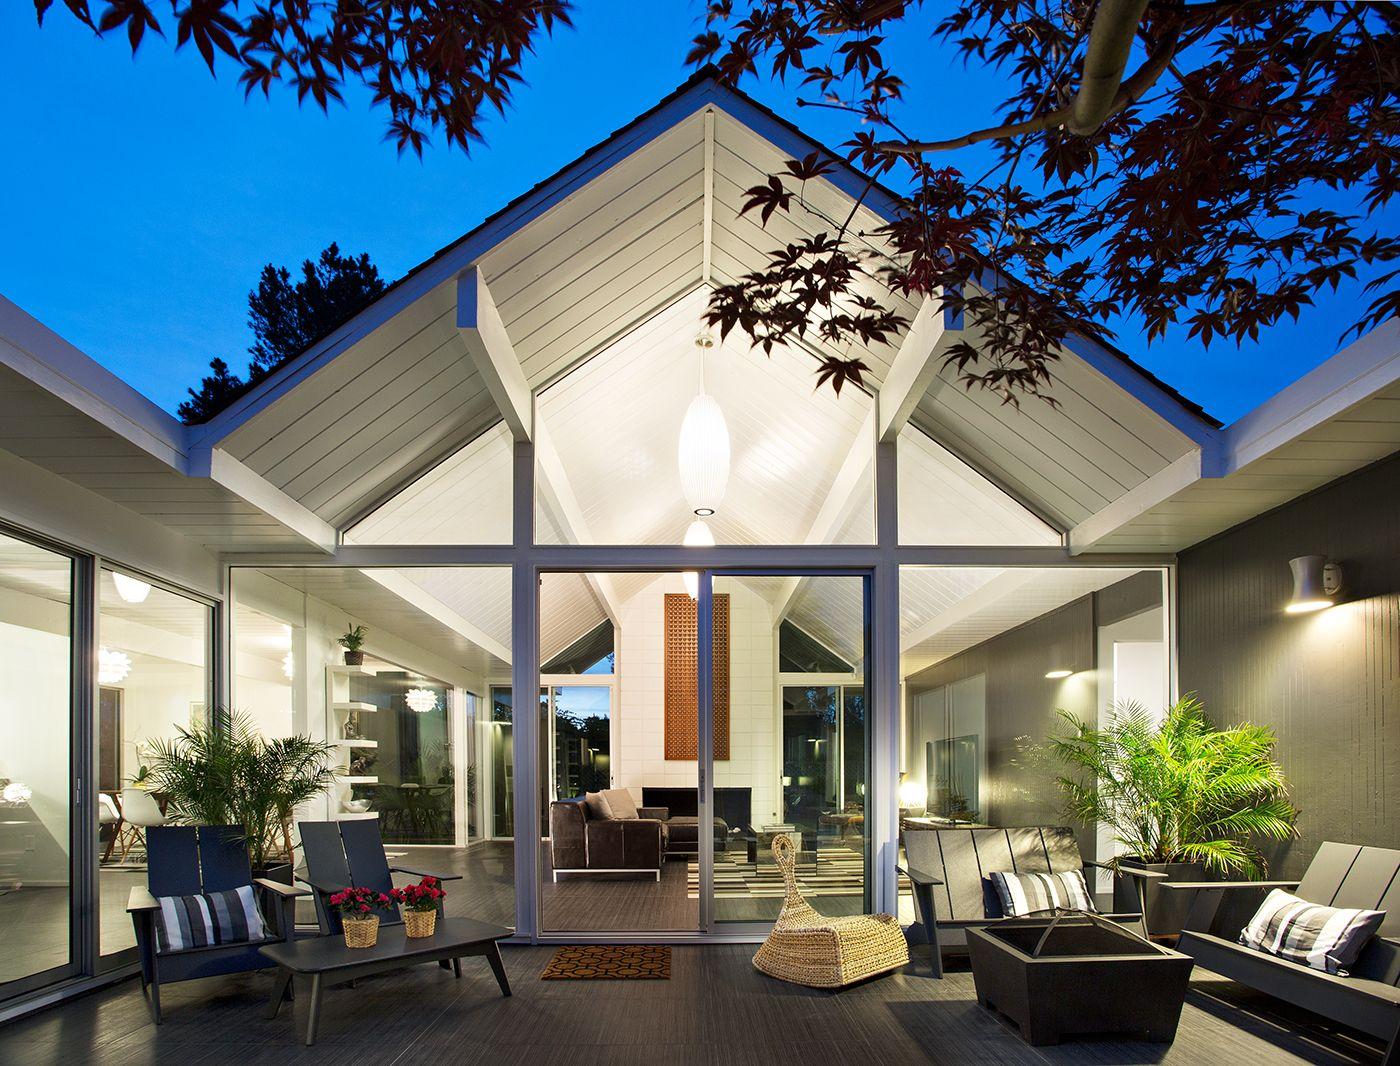 Klopf Architecture - Project - Double Gable Eichler Remodel